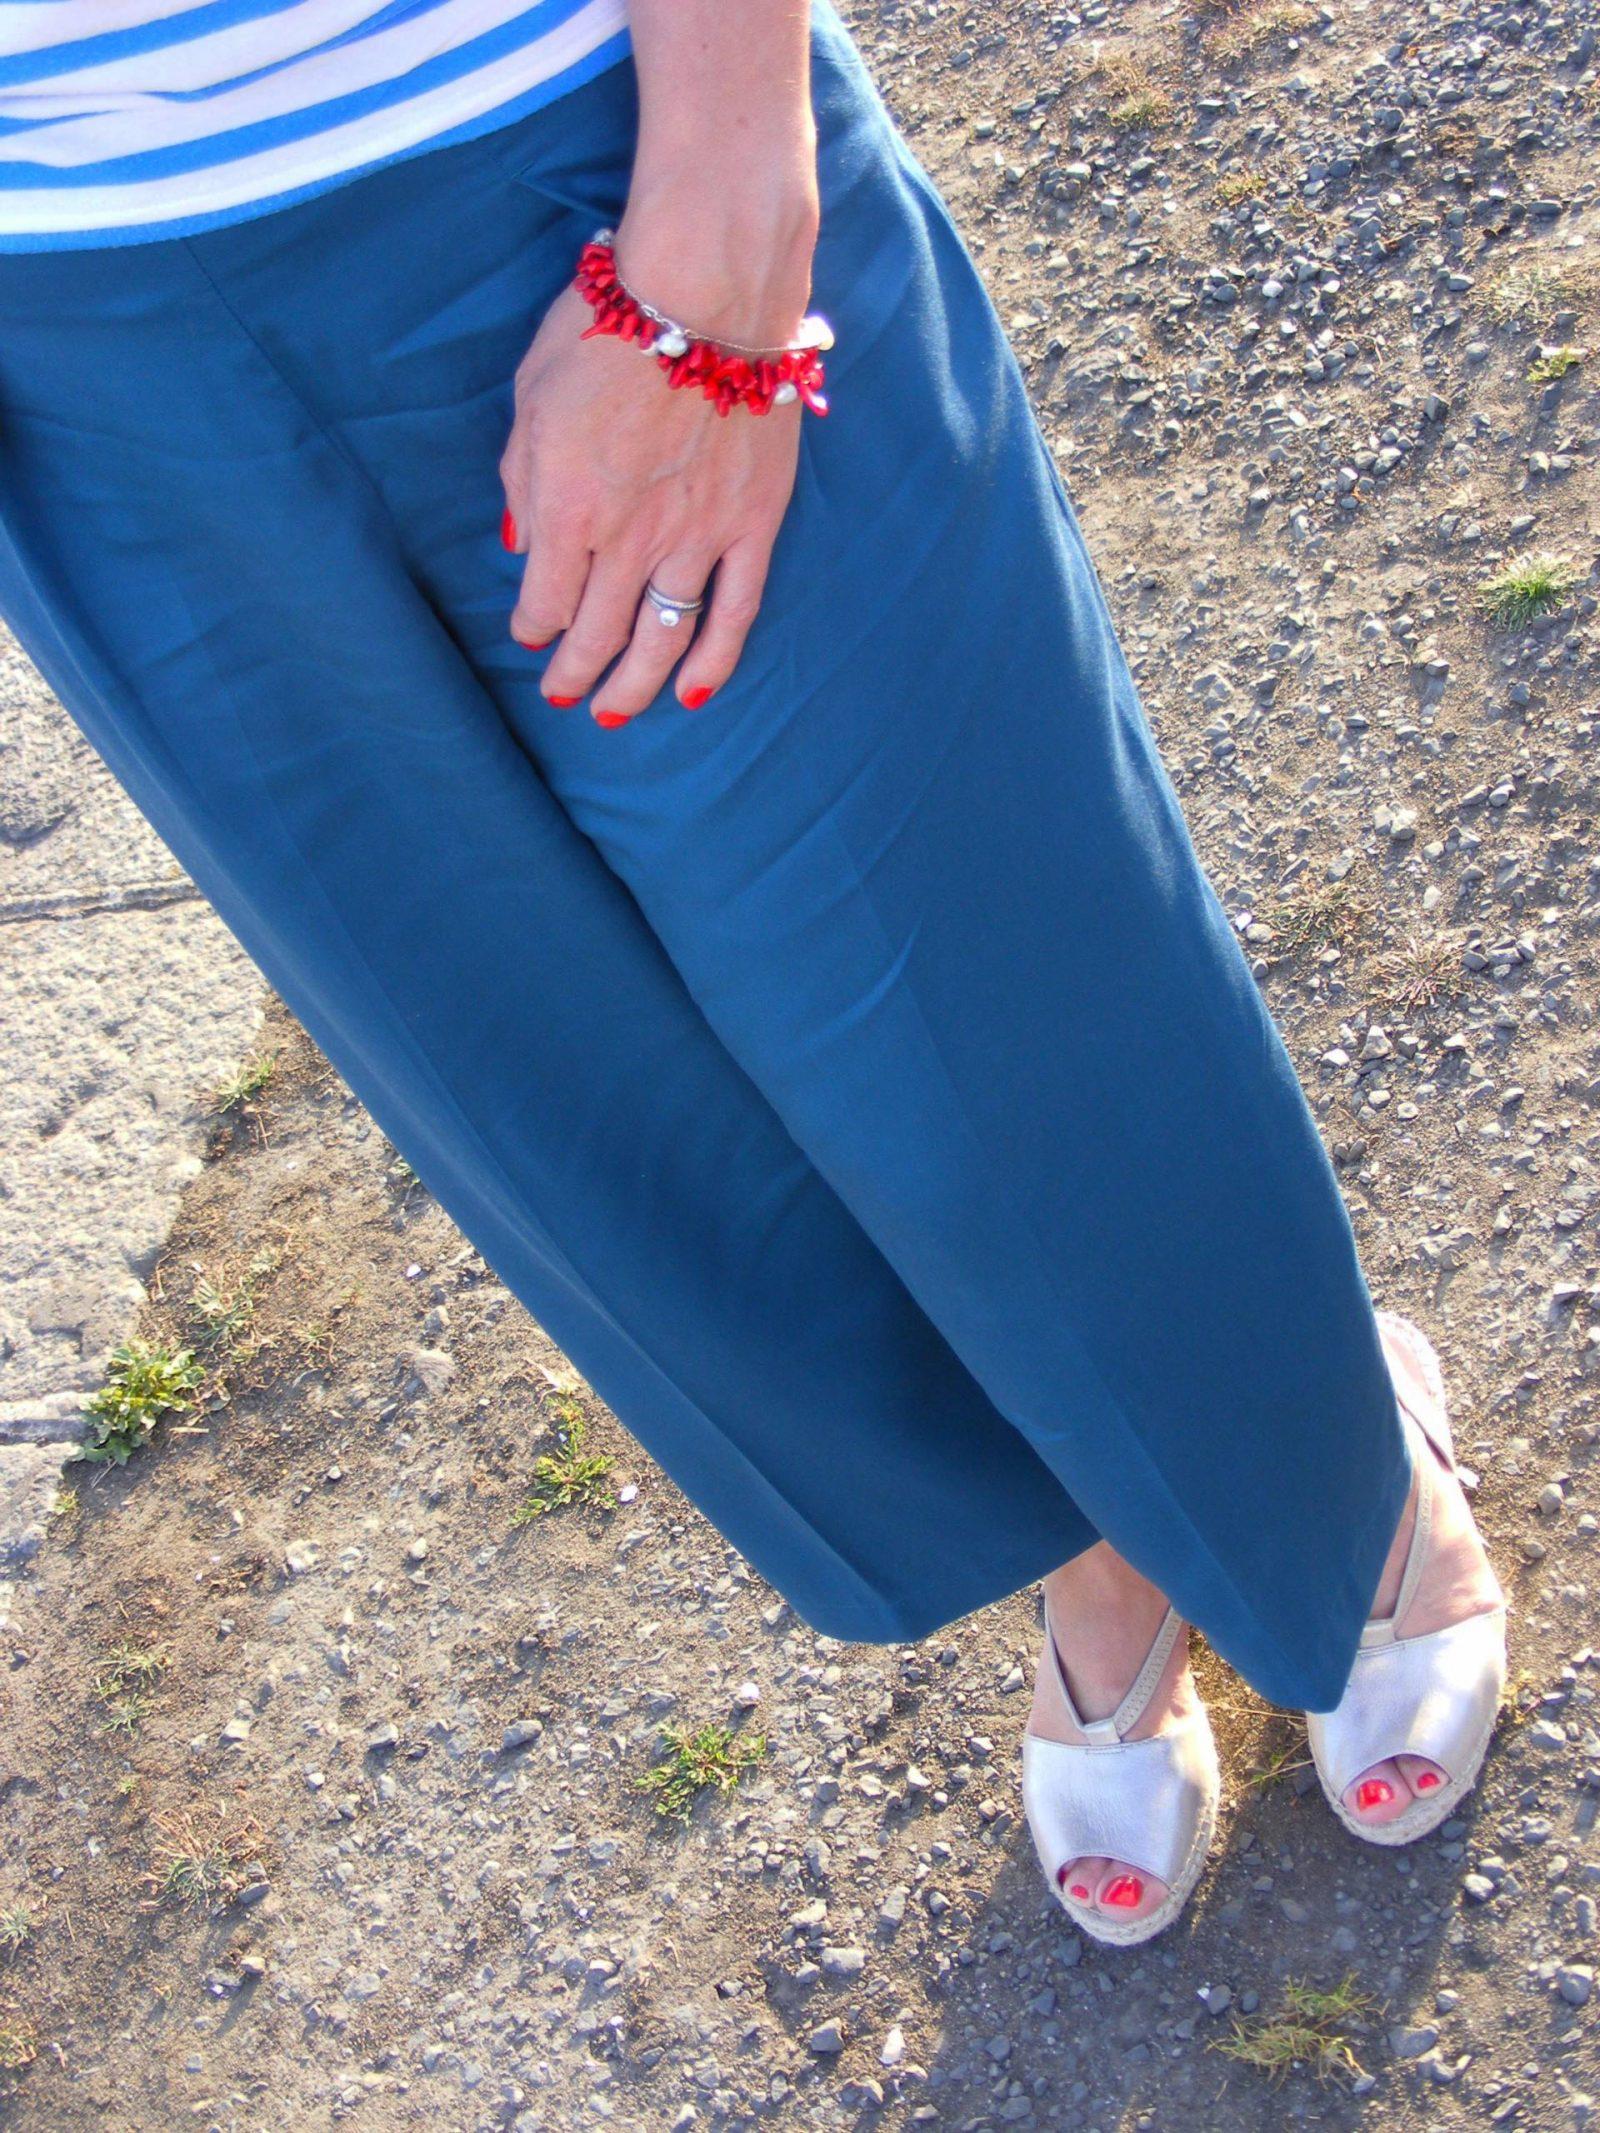 Breton Stripes and Asos Culottes Clarks gold espadrilles